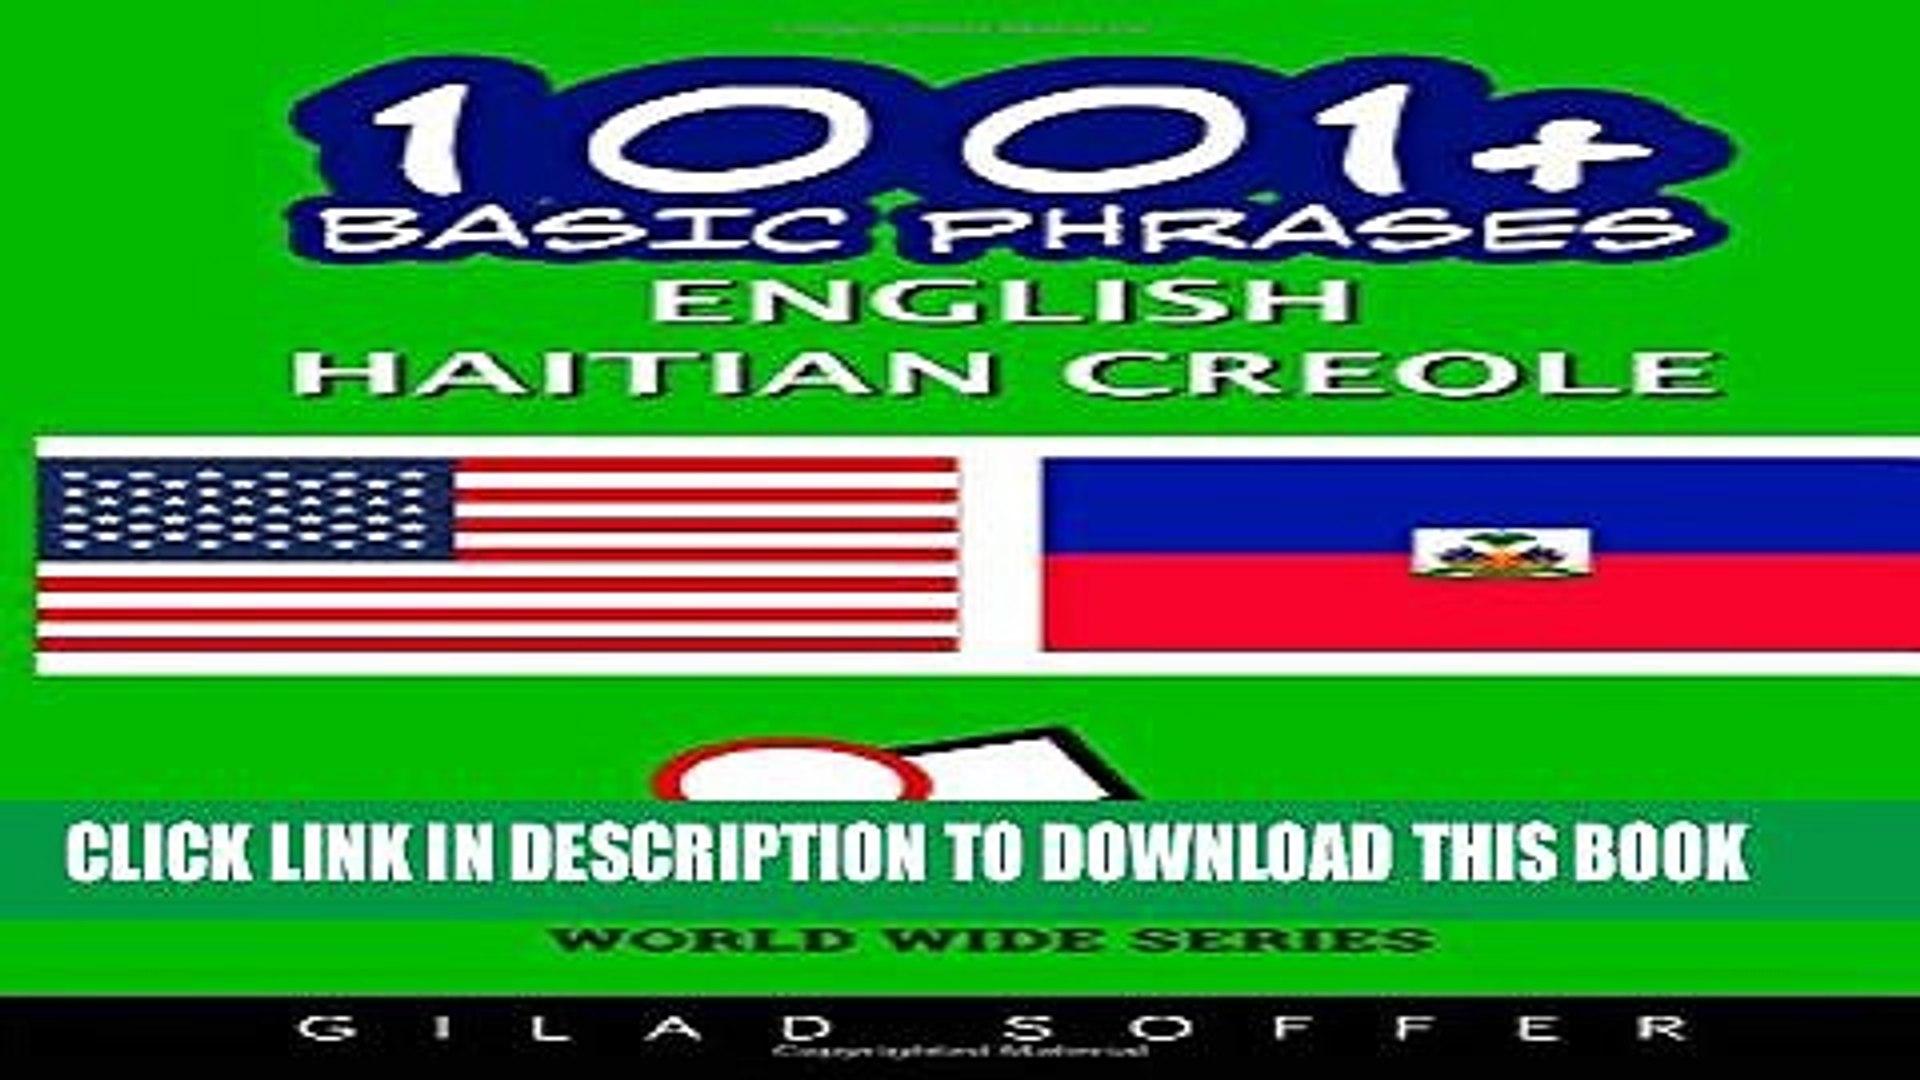 1001+ Basic Phrases English - Haitian Creole